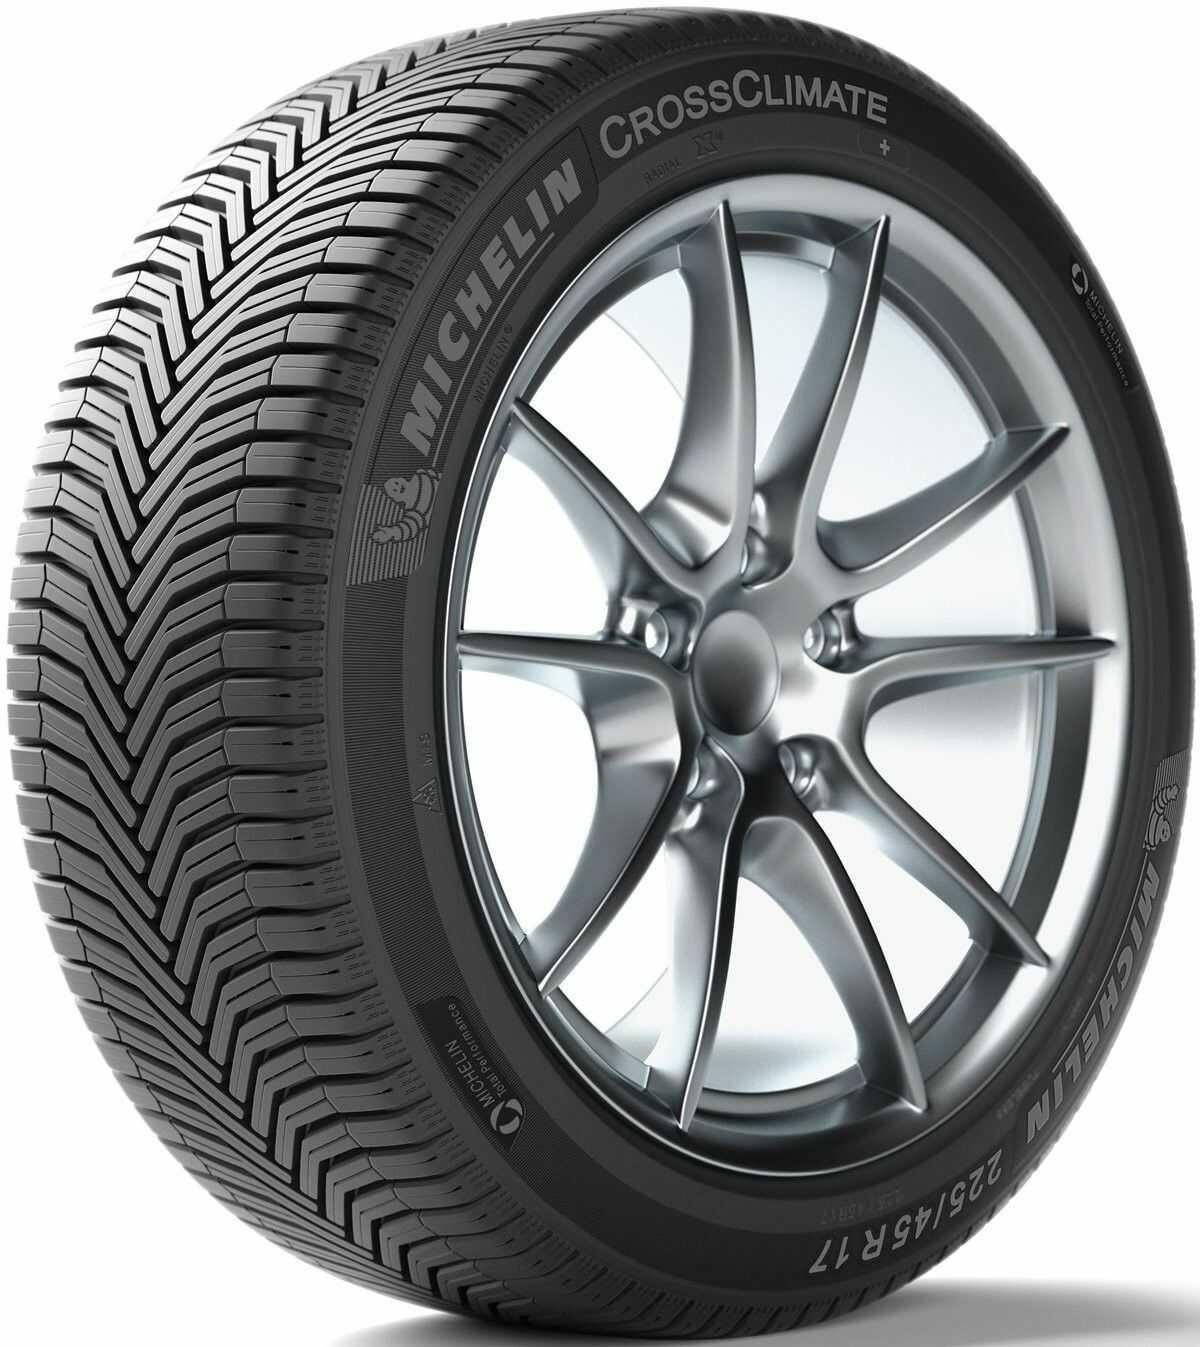 Michelin CrossClimate+ 185/60R15 88 V XL